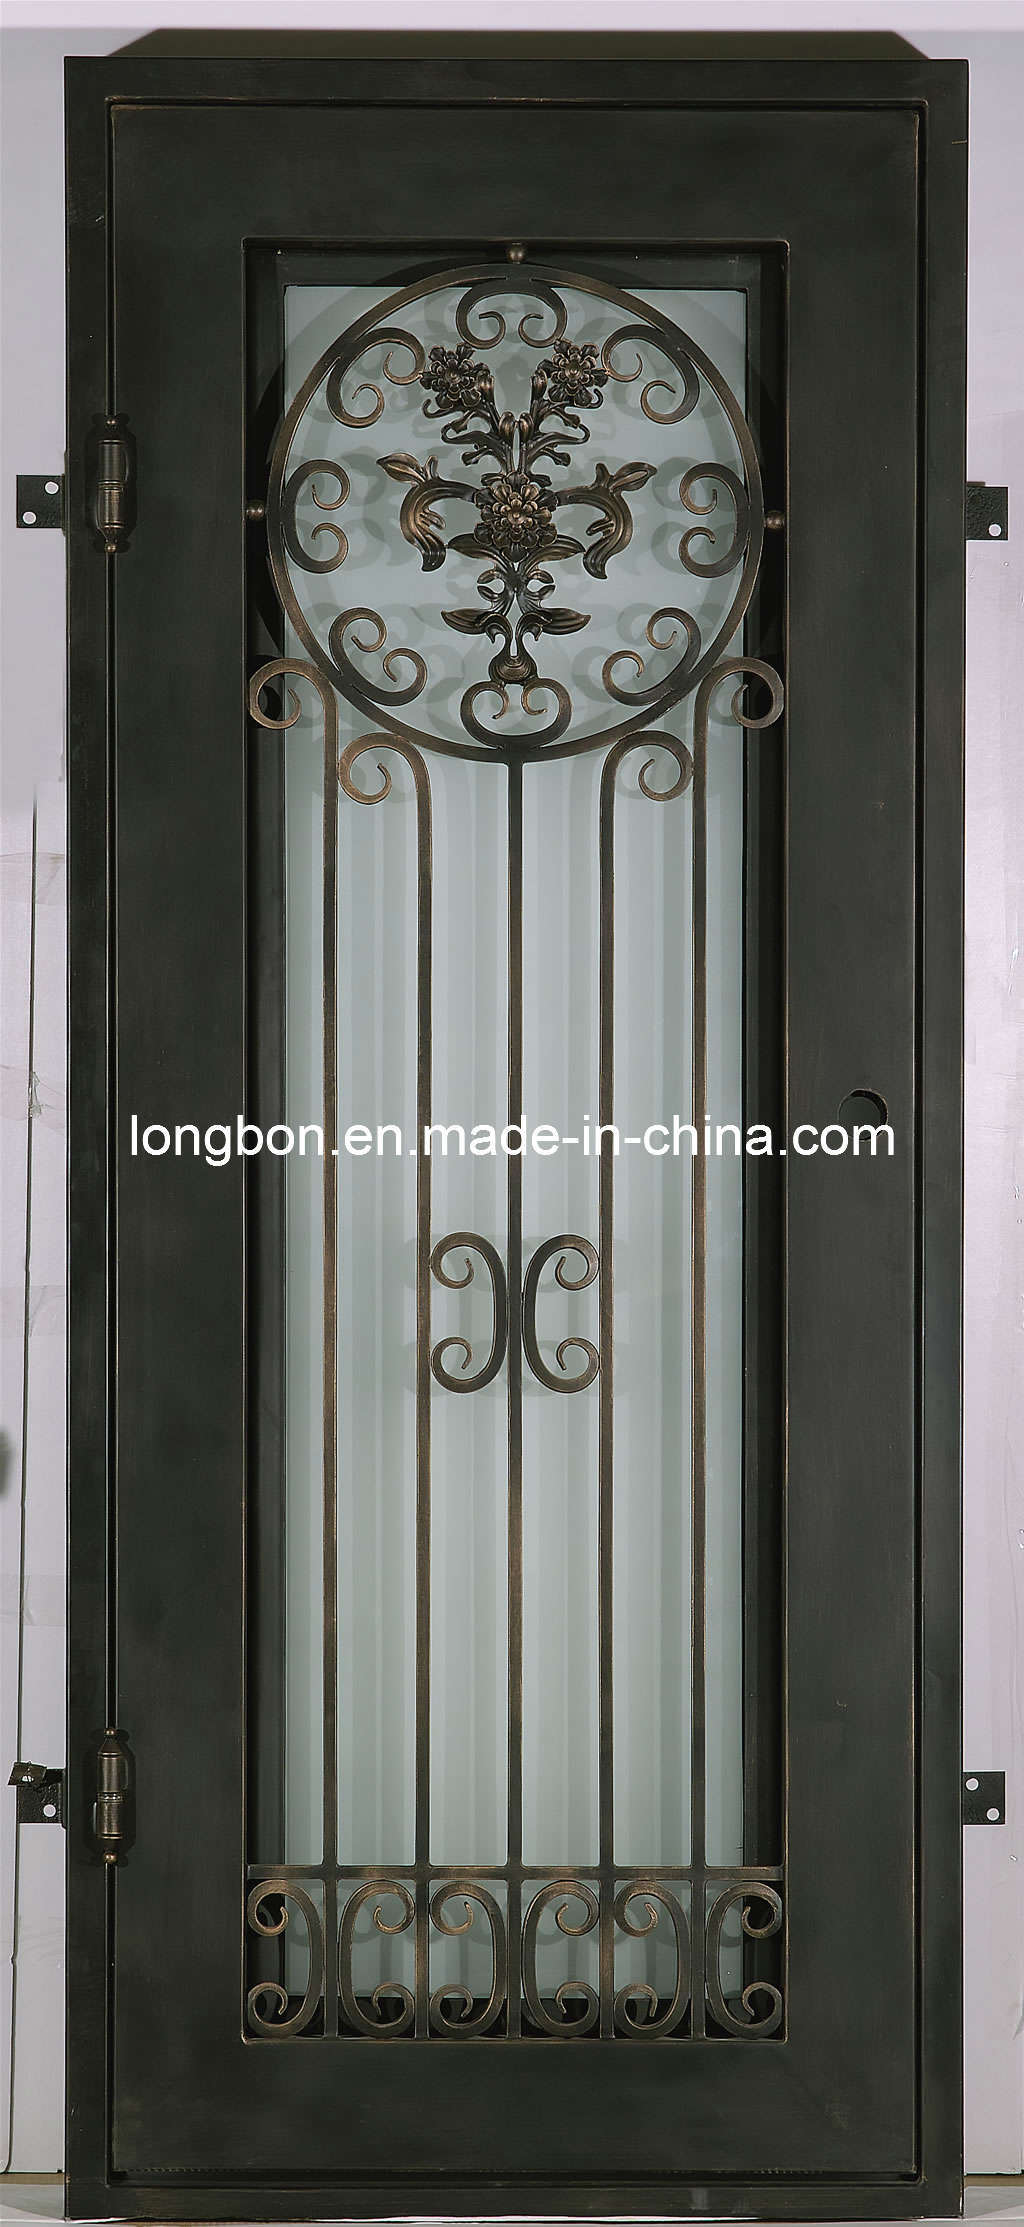 China 2012 Modern Wrought Iron Entrance Door Lb I D 0010